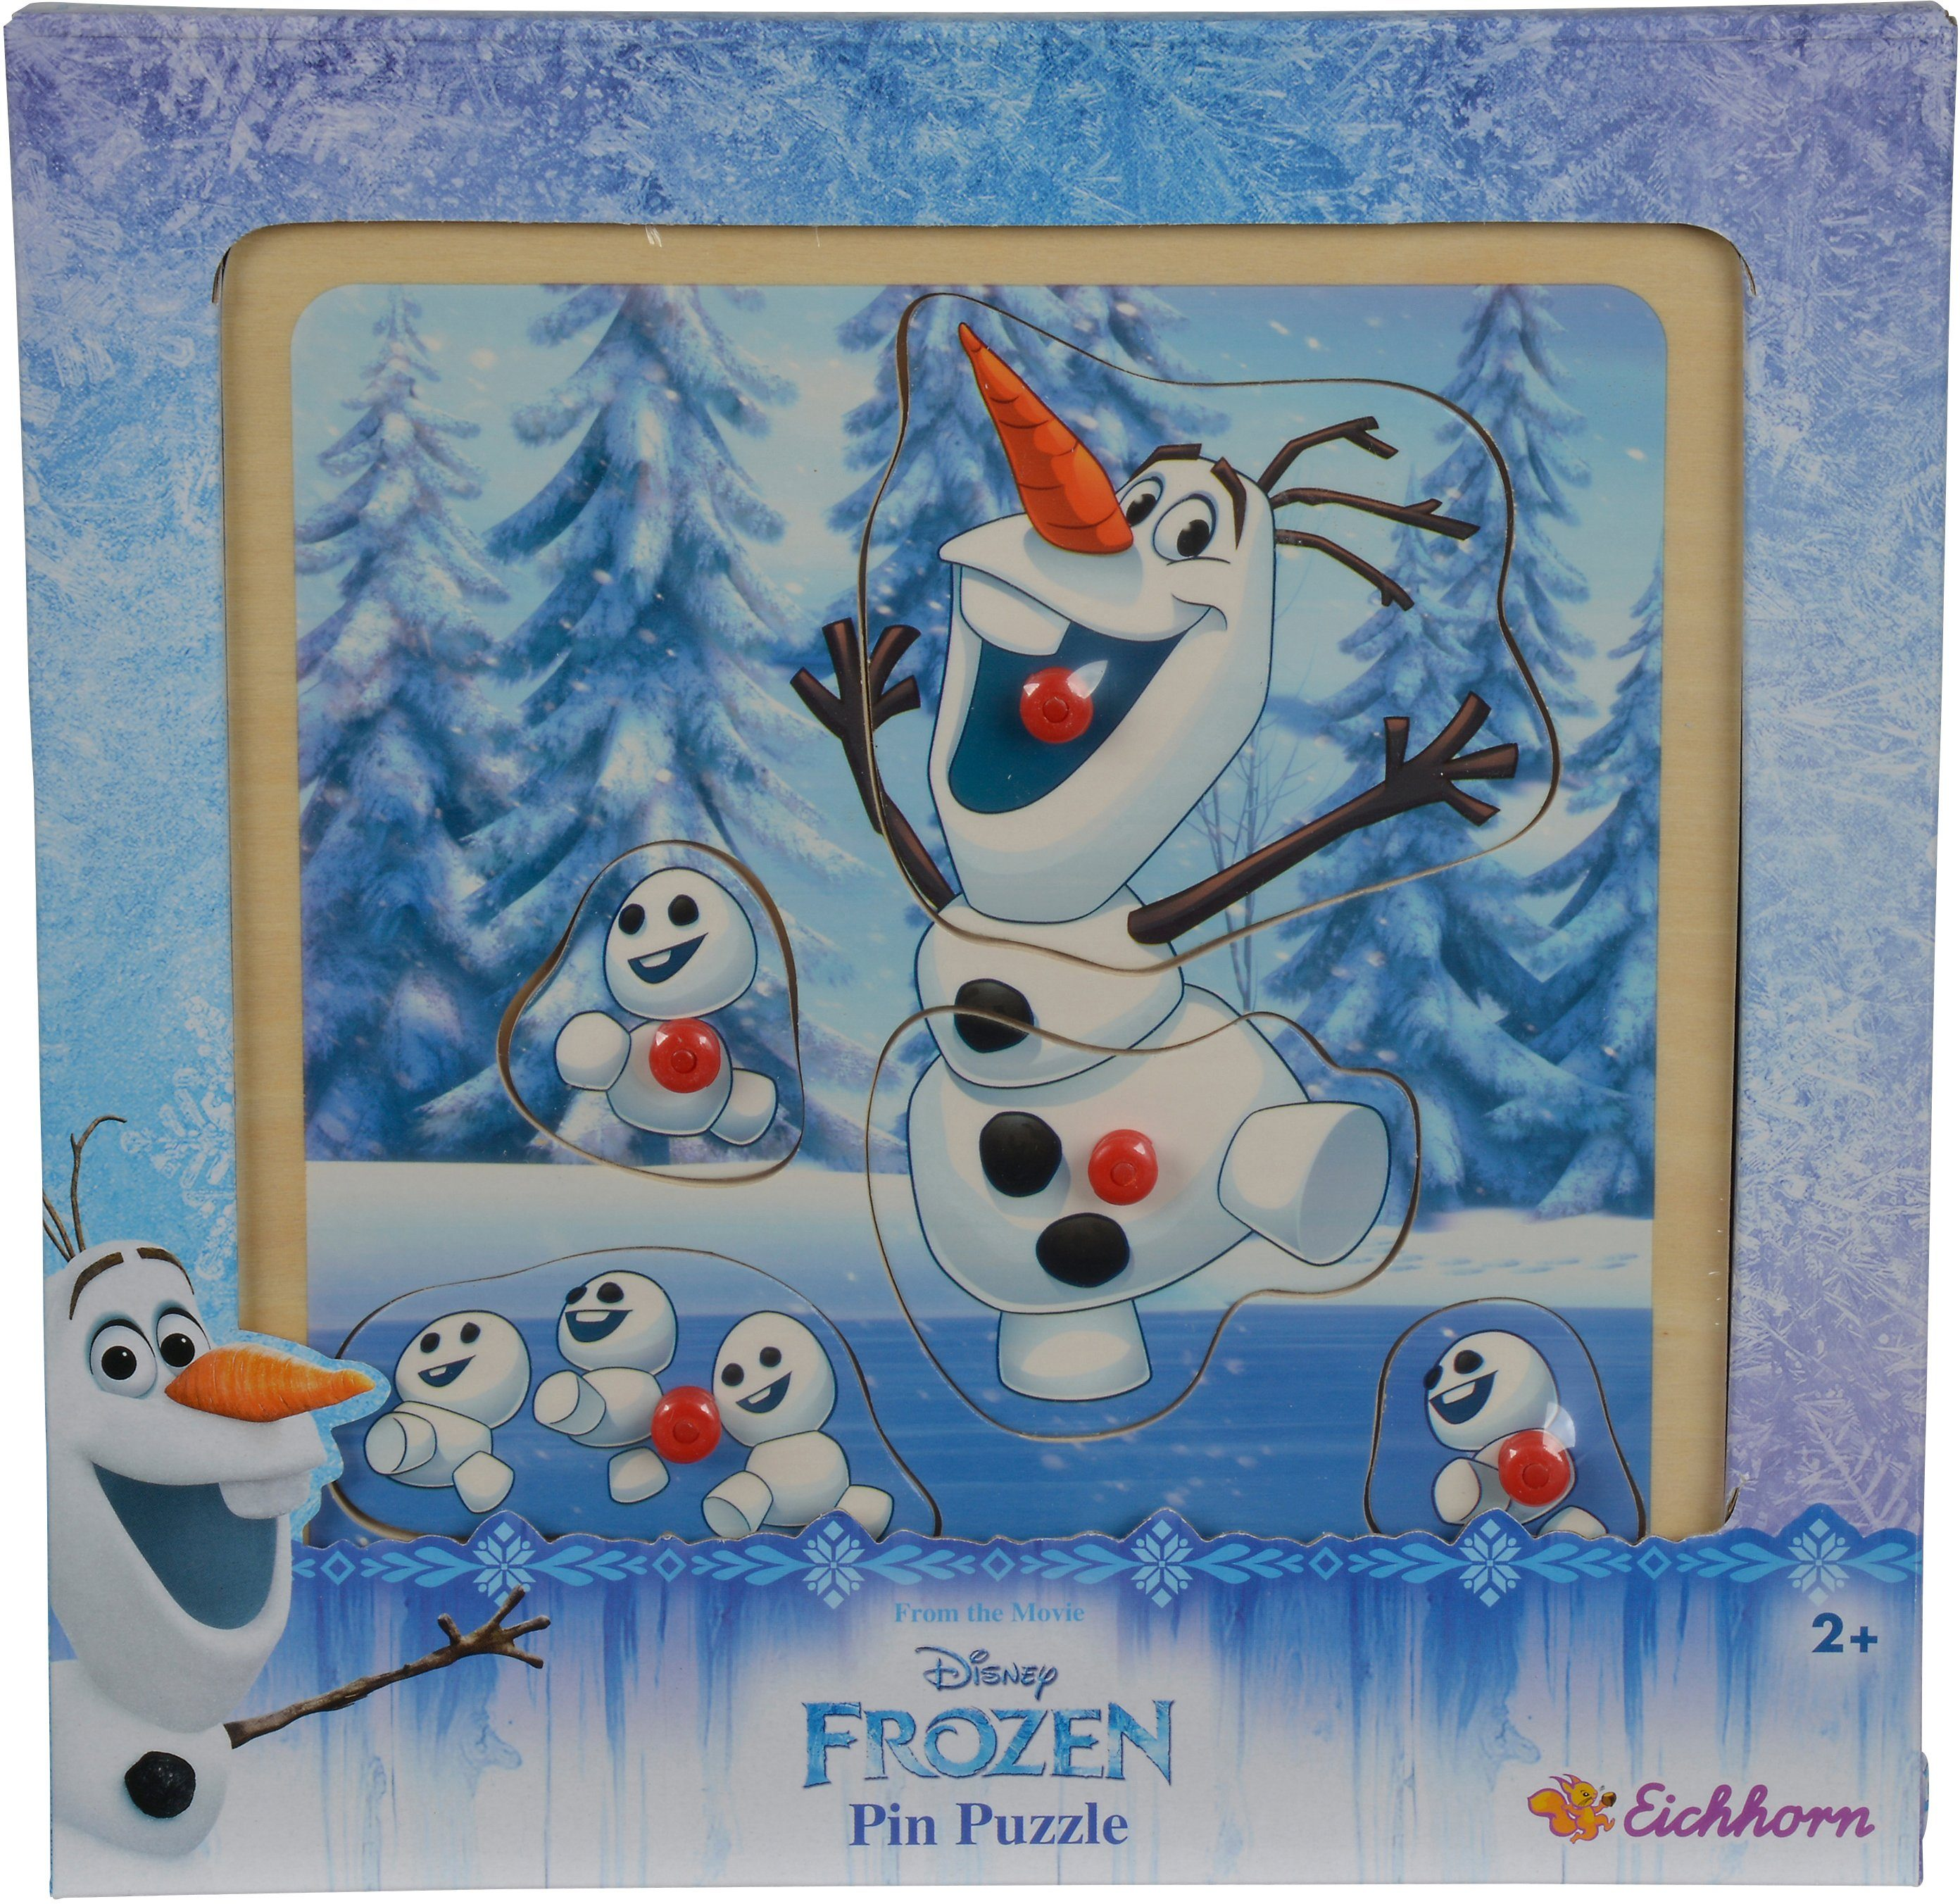 Eichhorn Holzpuzzle, »Disney Frozen Olaf Steckpuzzle«